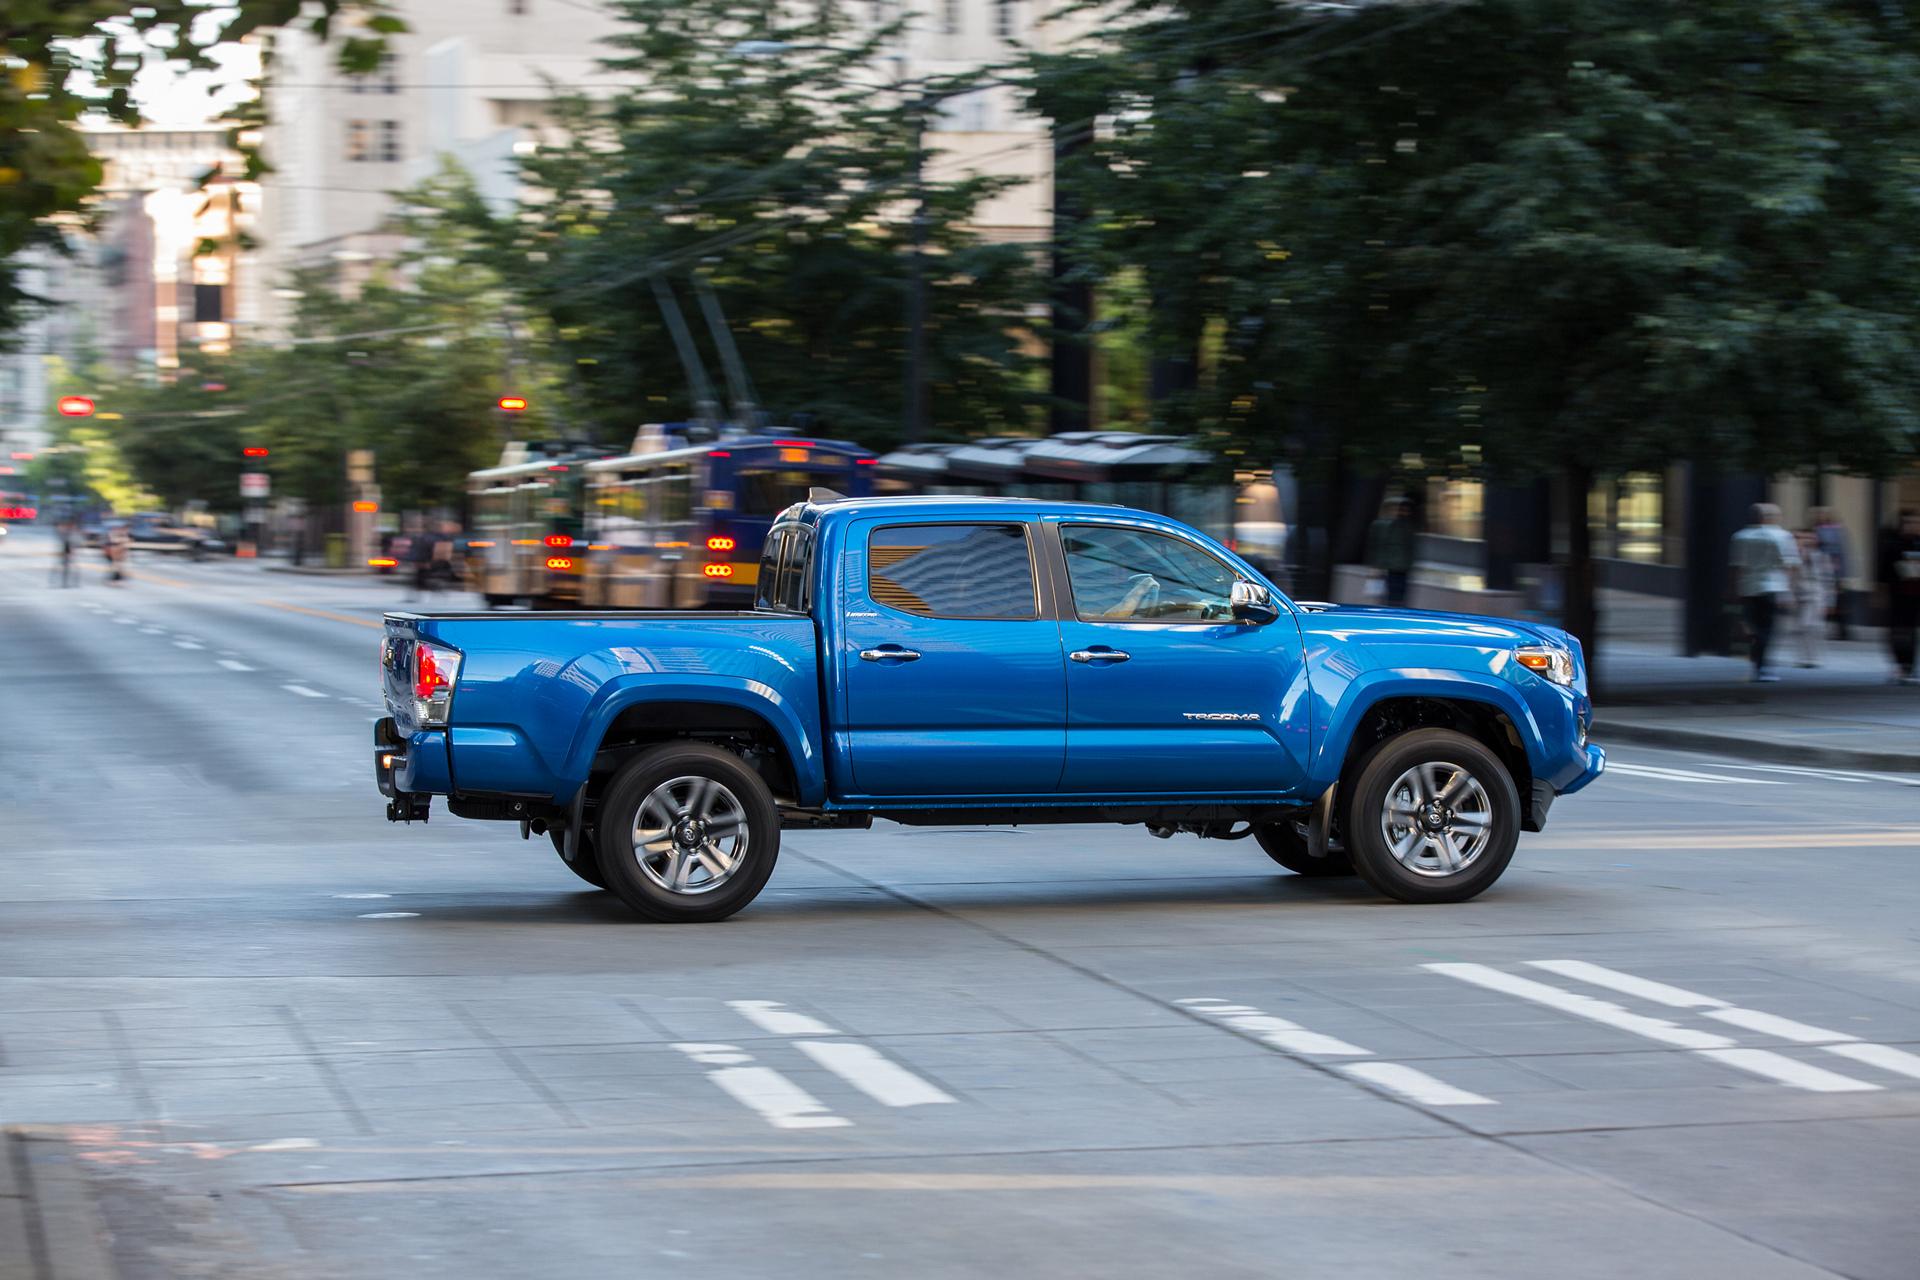 2016 Toyota Tacoma Limited © Toyota Motor Corporation